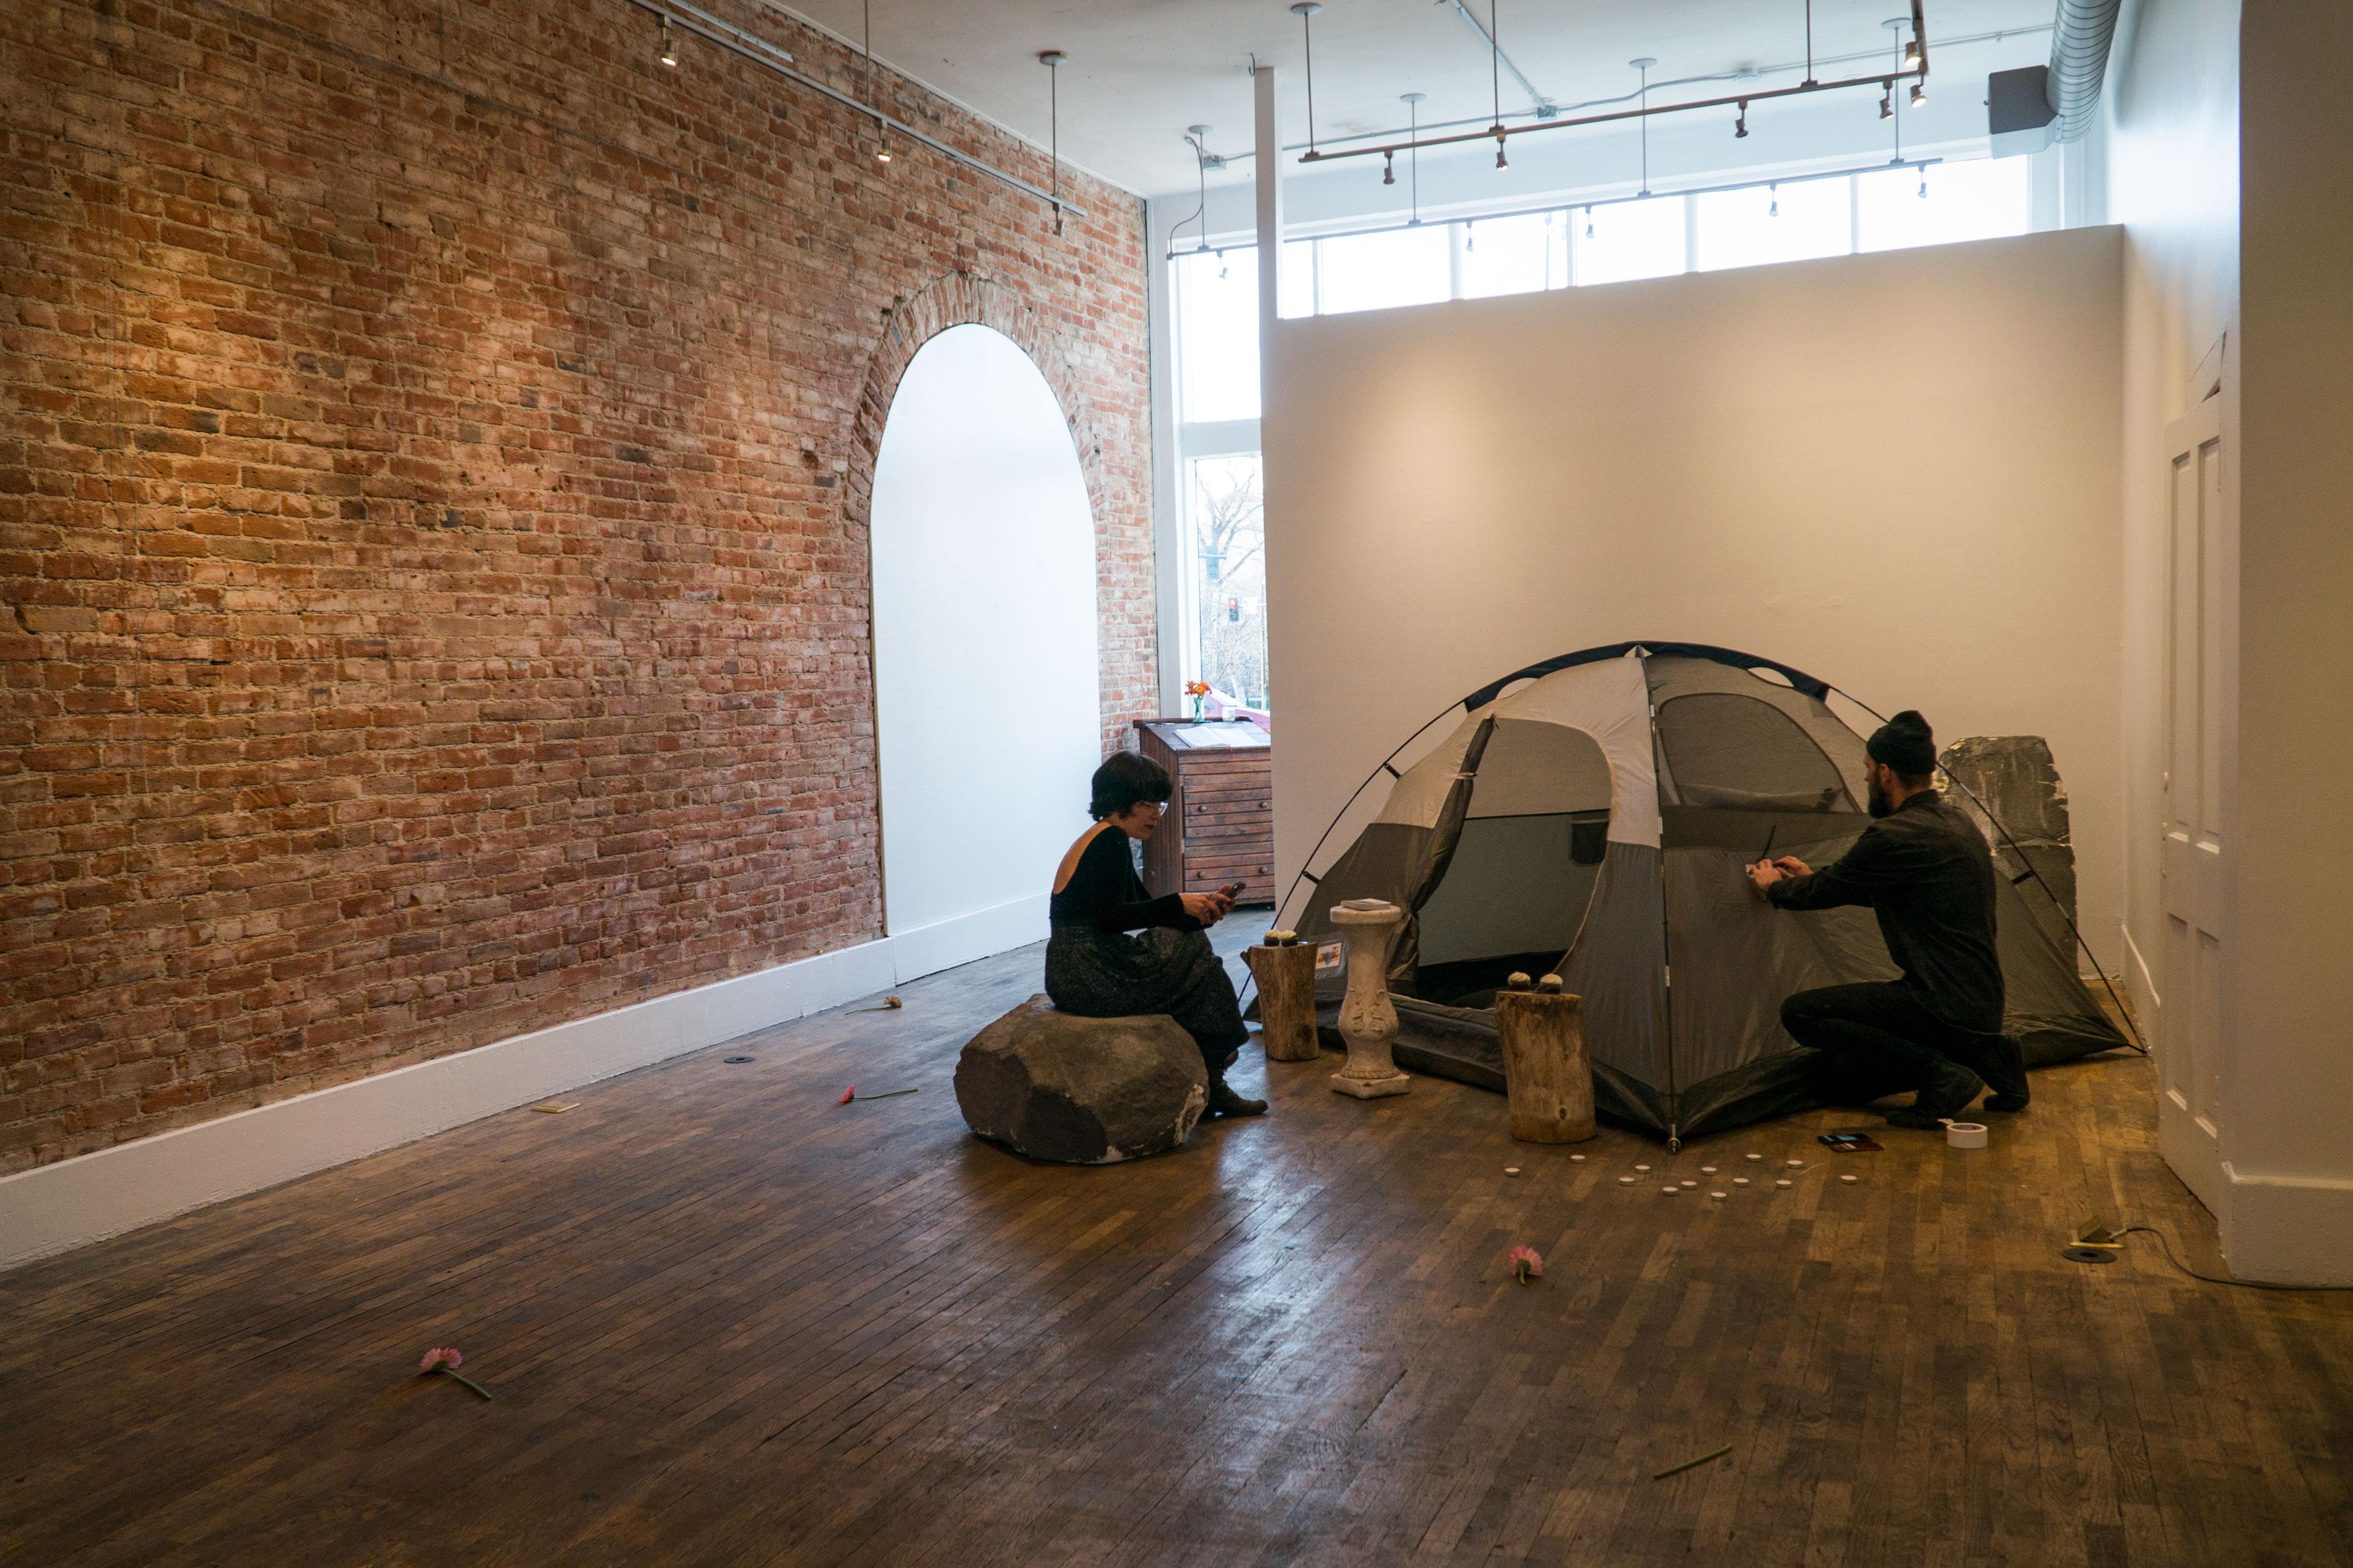 Photo: Blind Date Art 2 | Karpik And Hernandez Setup Tent - SWolf